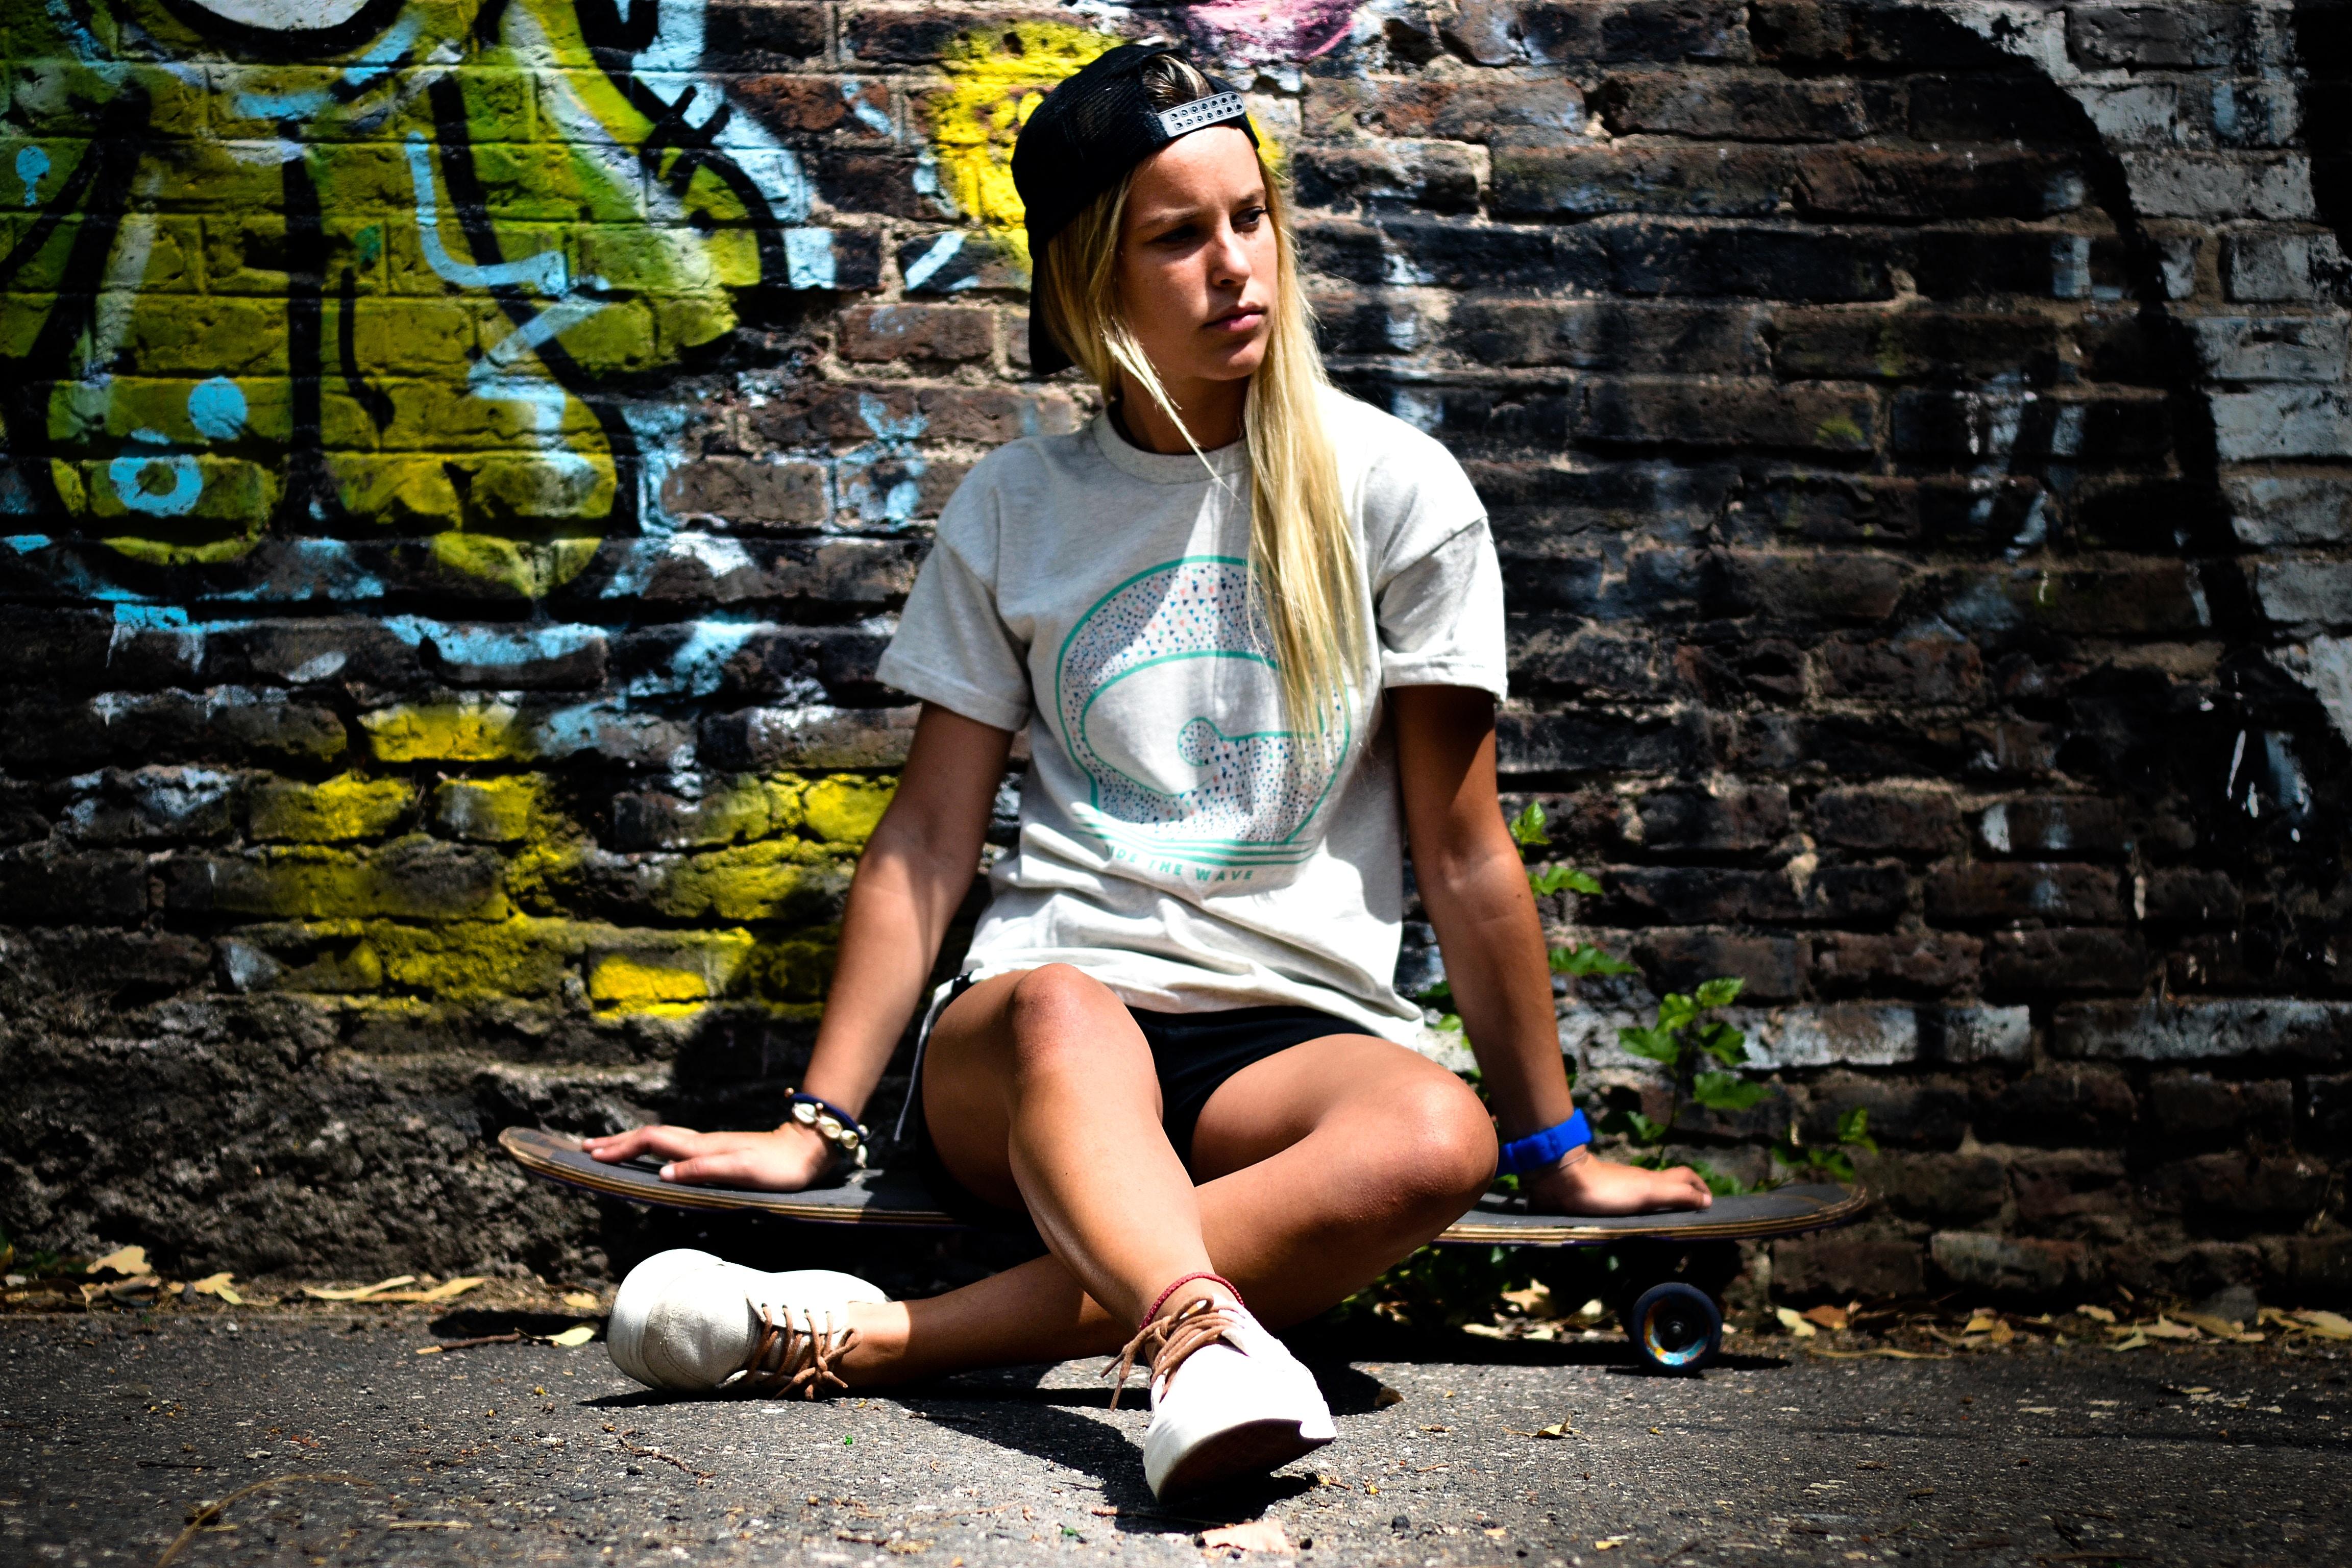 woman in white shirt sitting on skateboard